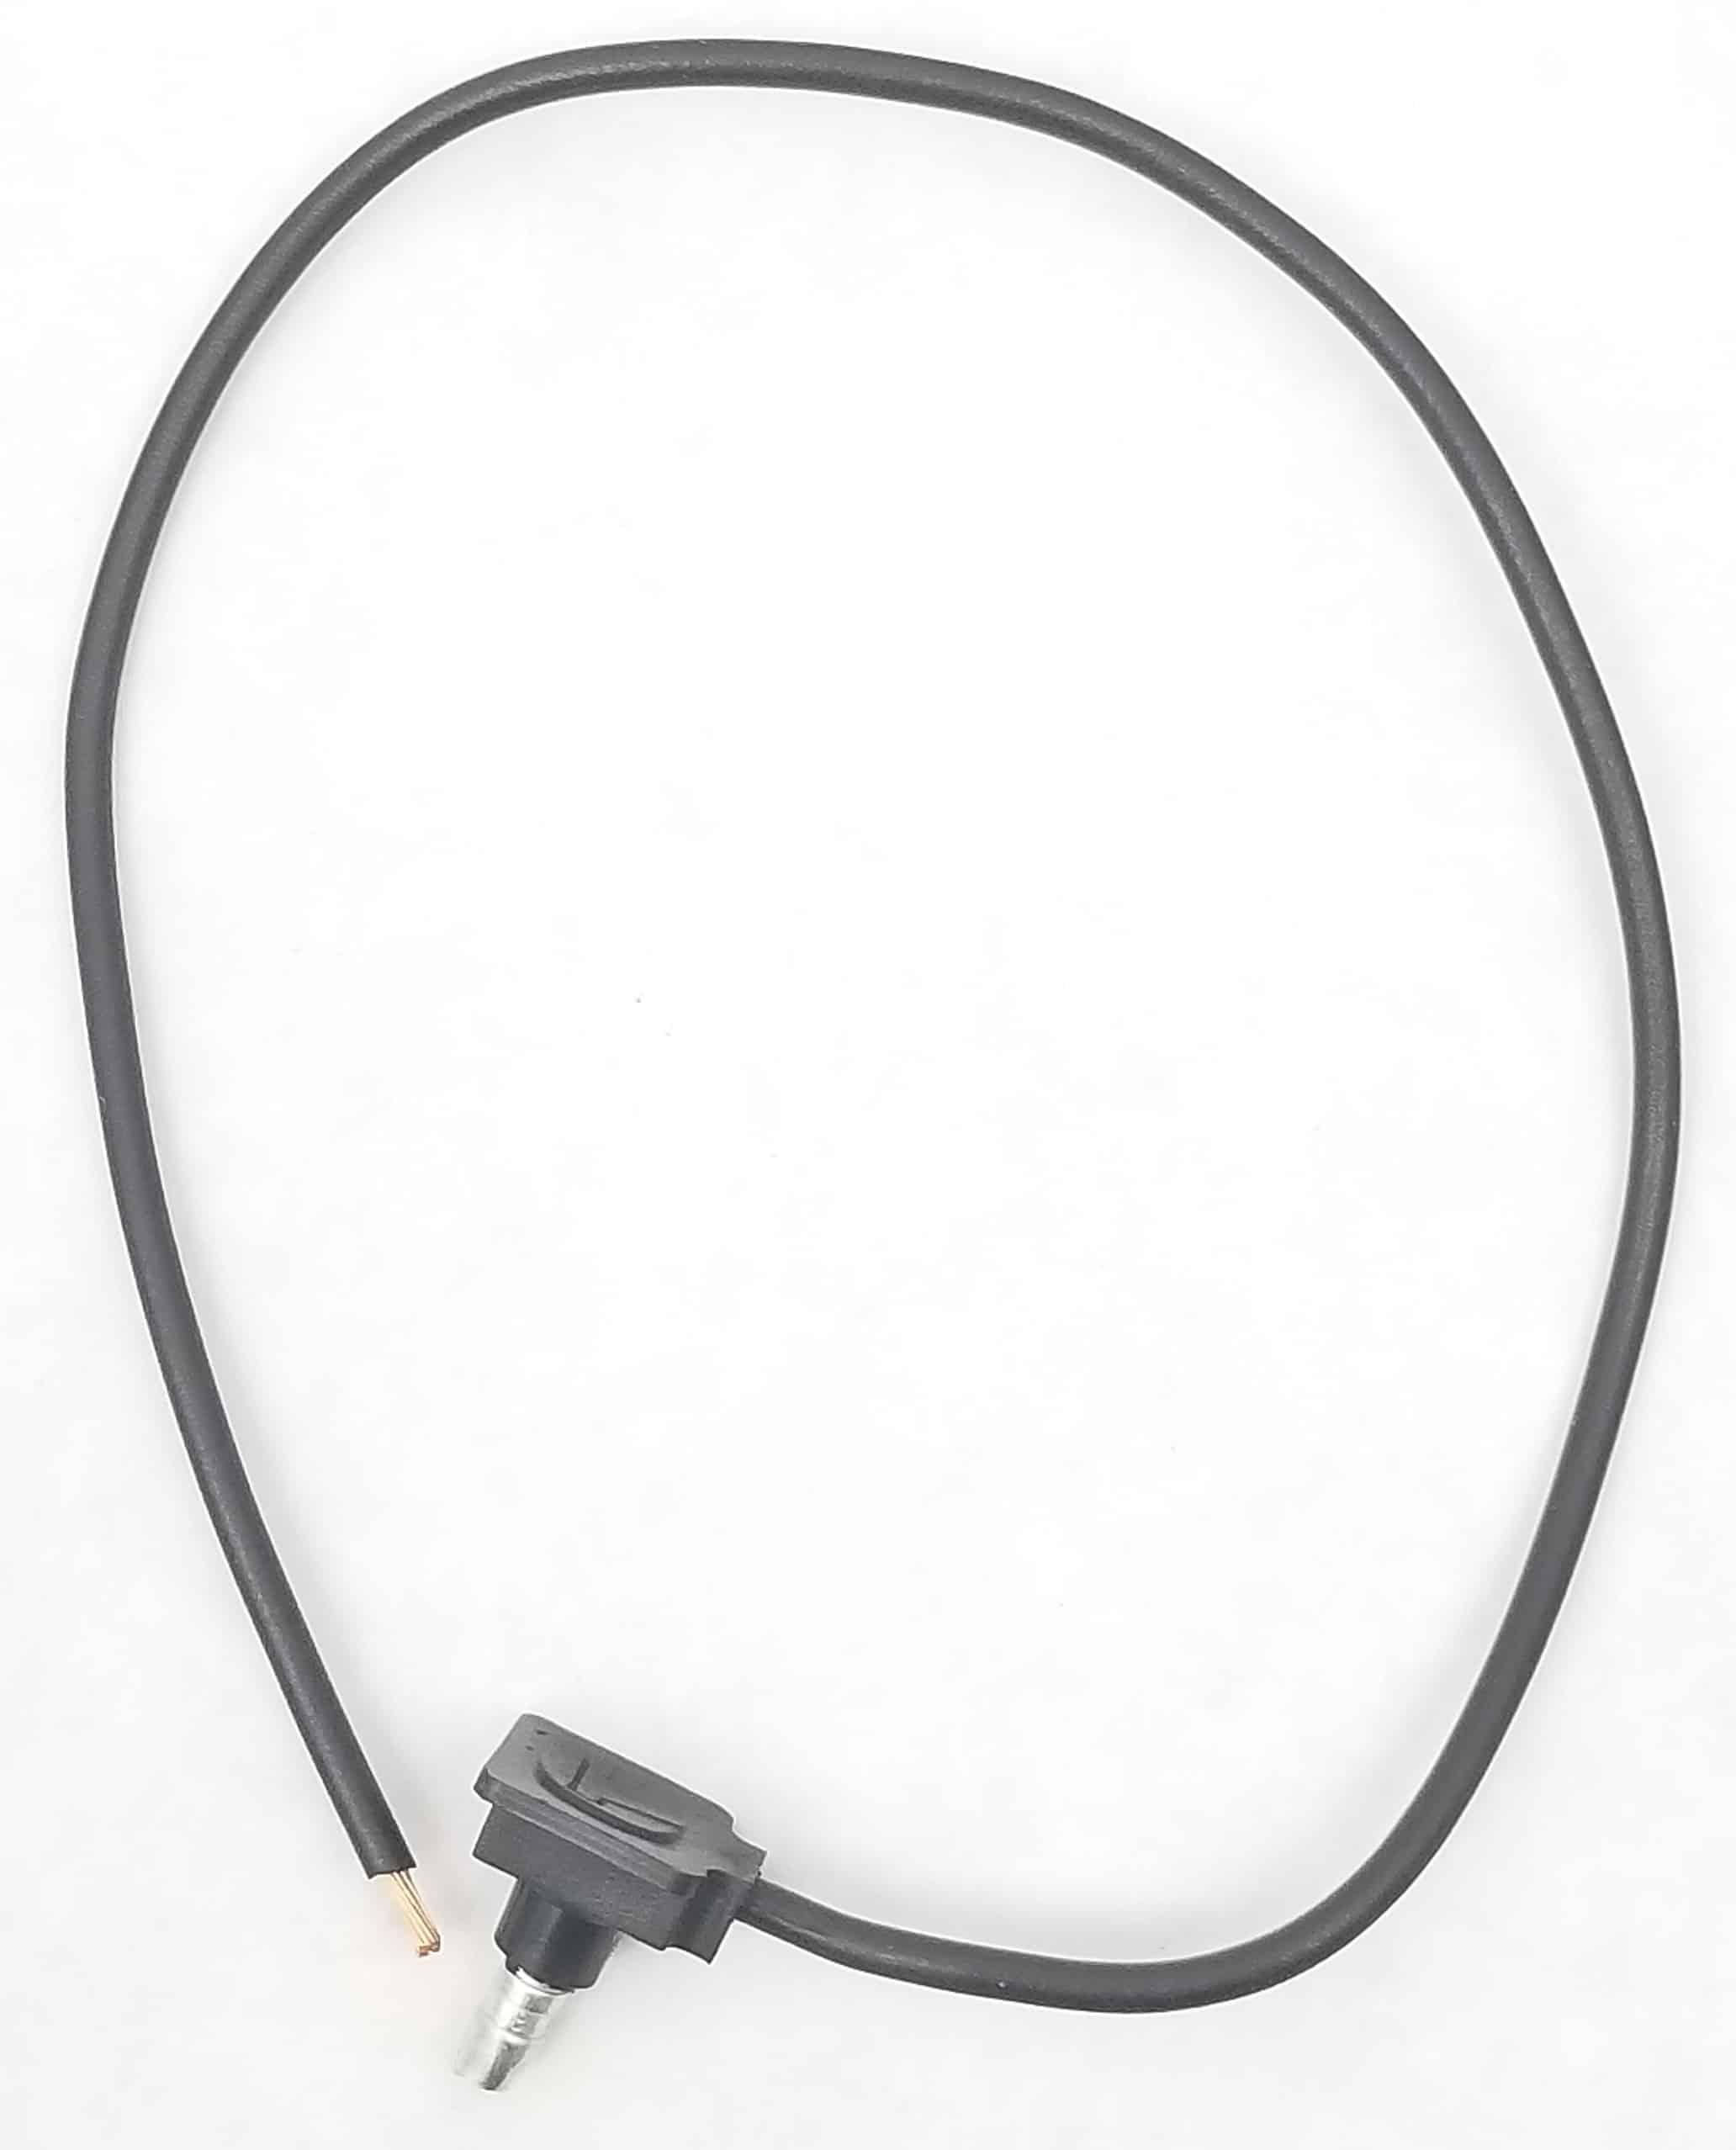 04996930 - Super 21 Plug Trucklite